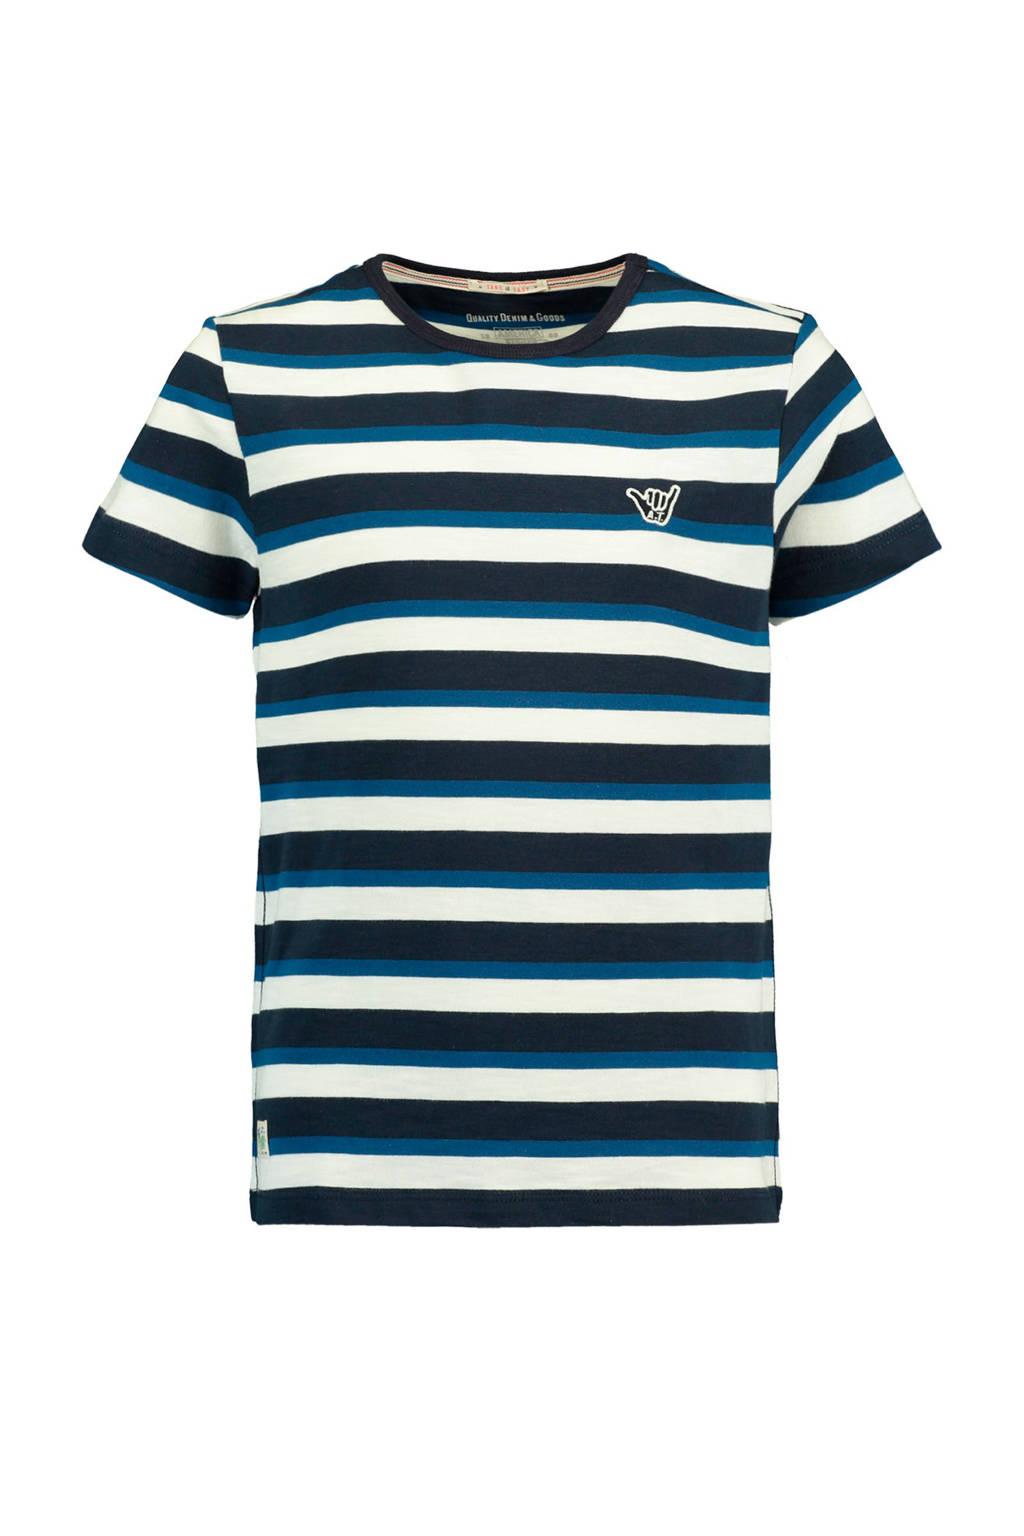 America Today Junior gestreept T-shirt Evan blauw, Donkerblauw